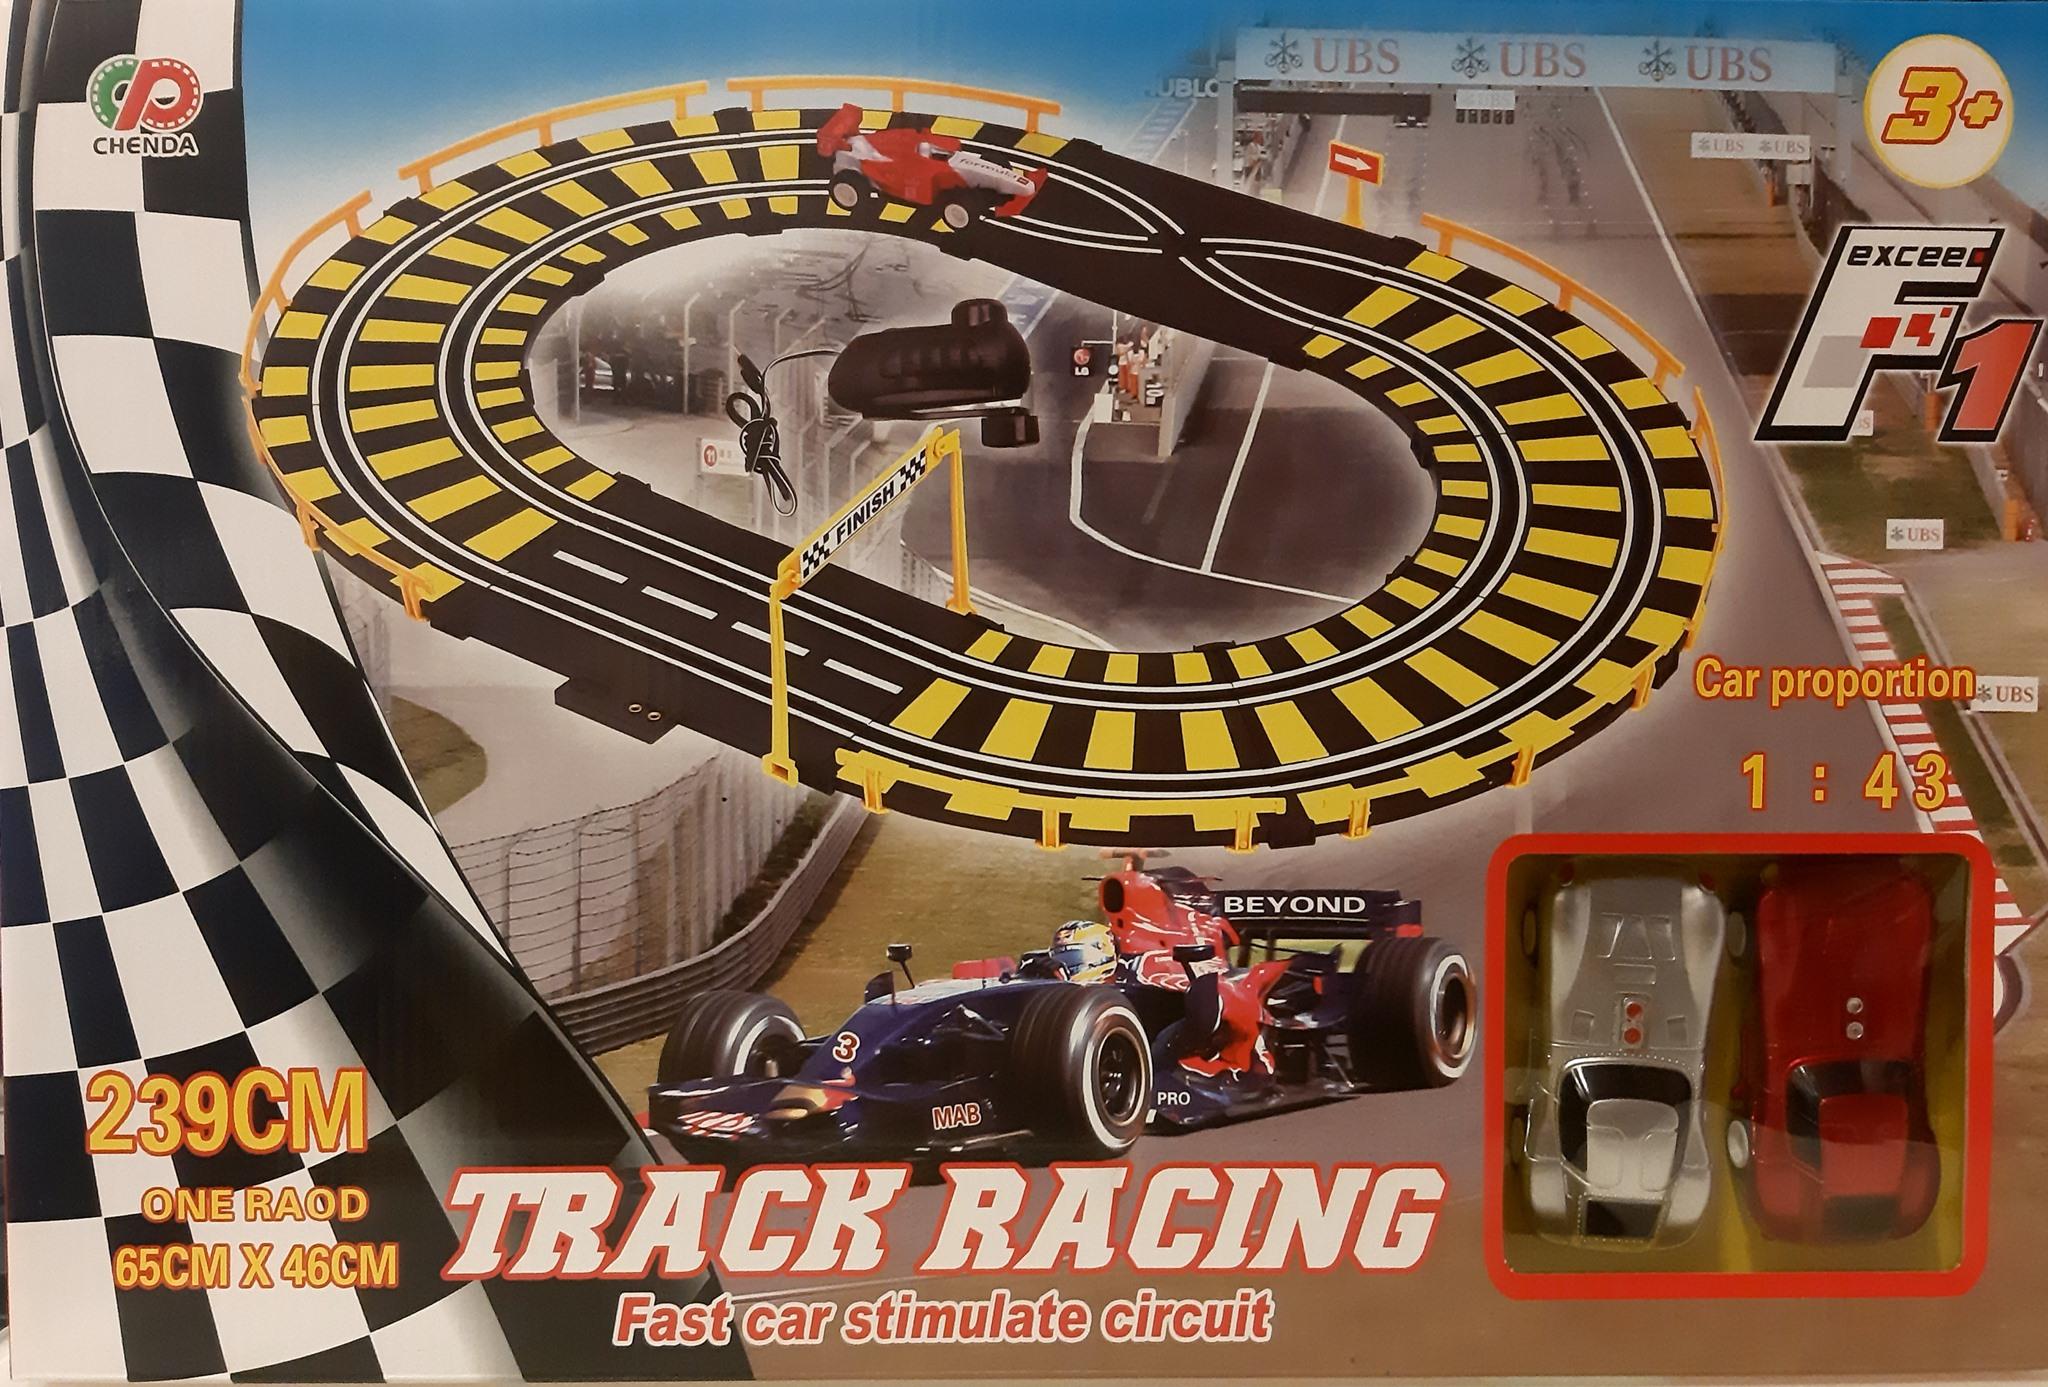 TRACK RACING FAST CAR STIMULATE CIRCUIT 239CM 384980